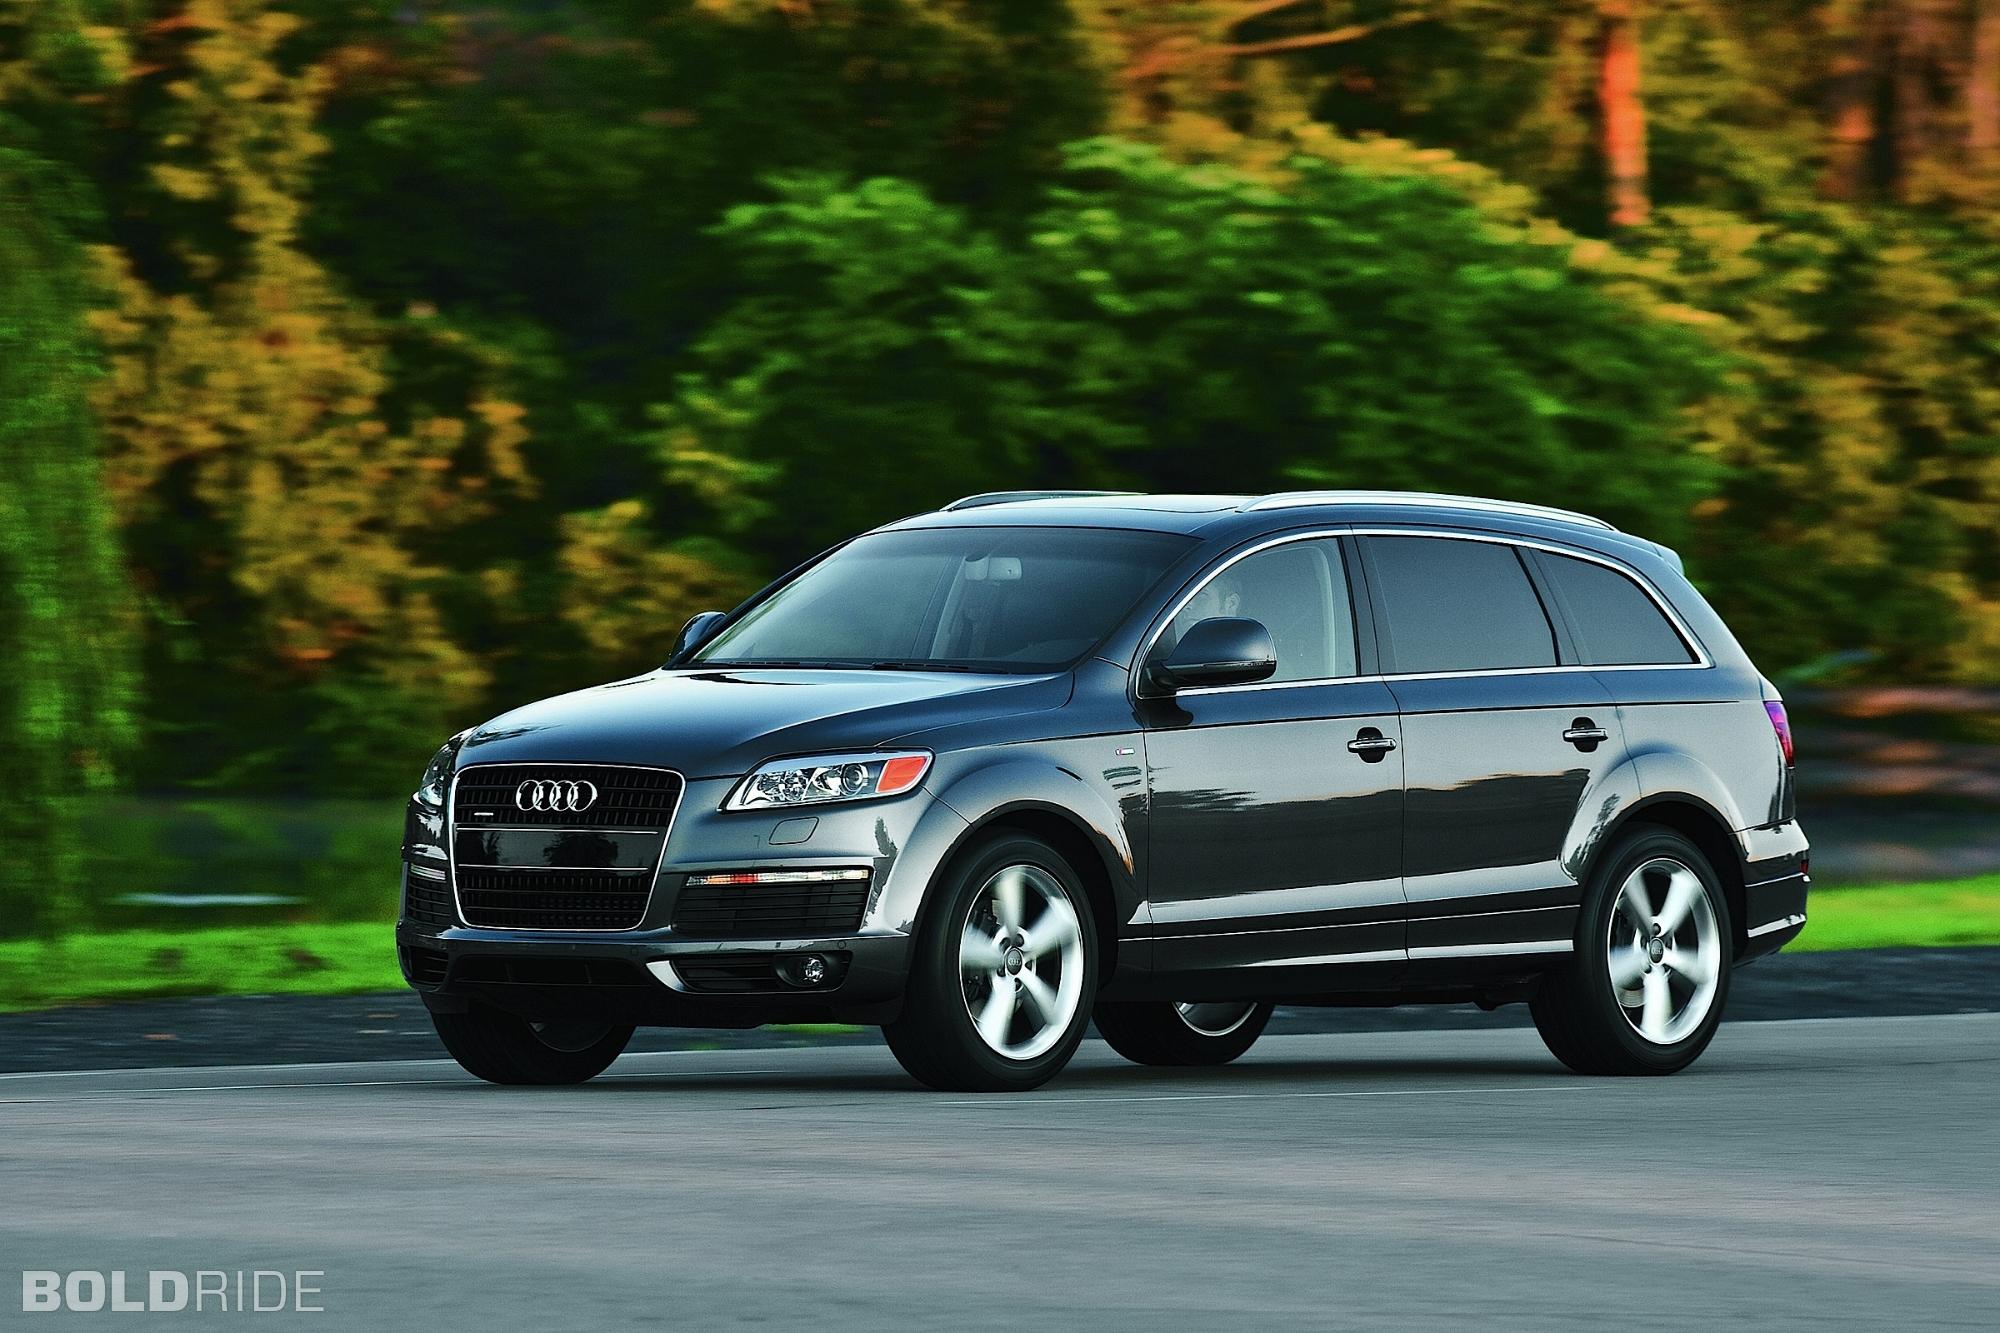 Audi Suv Q7 >> 2008 AUDI Q7 - Image #18